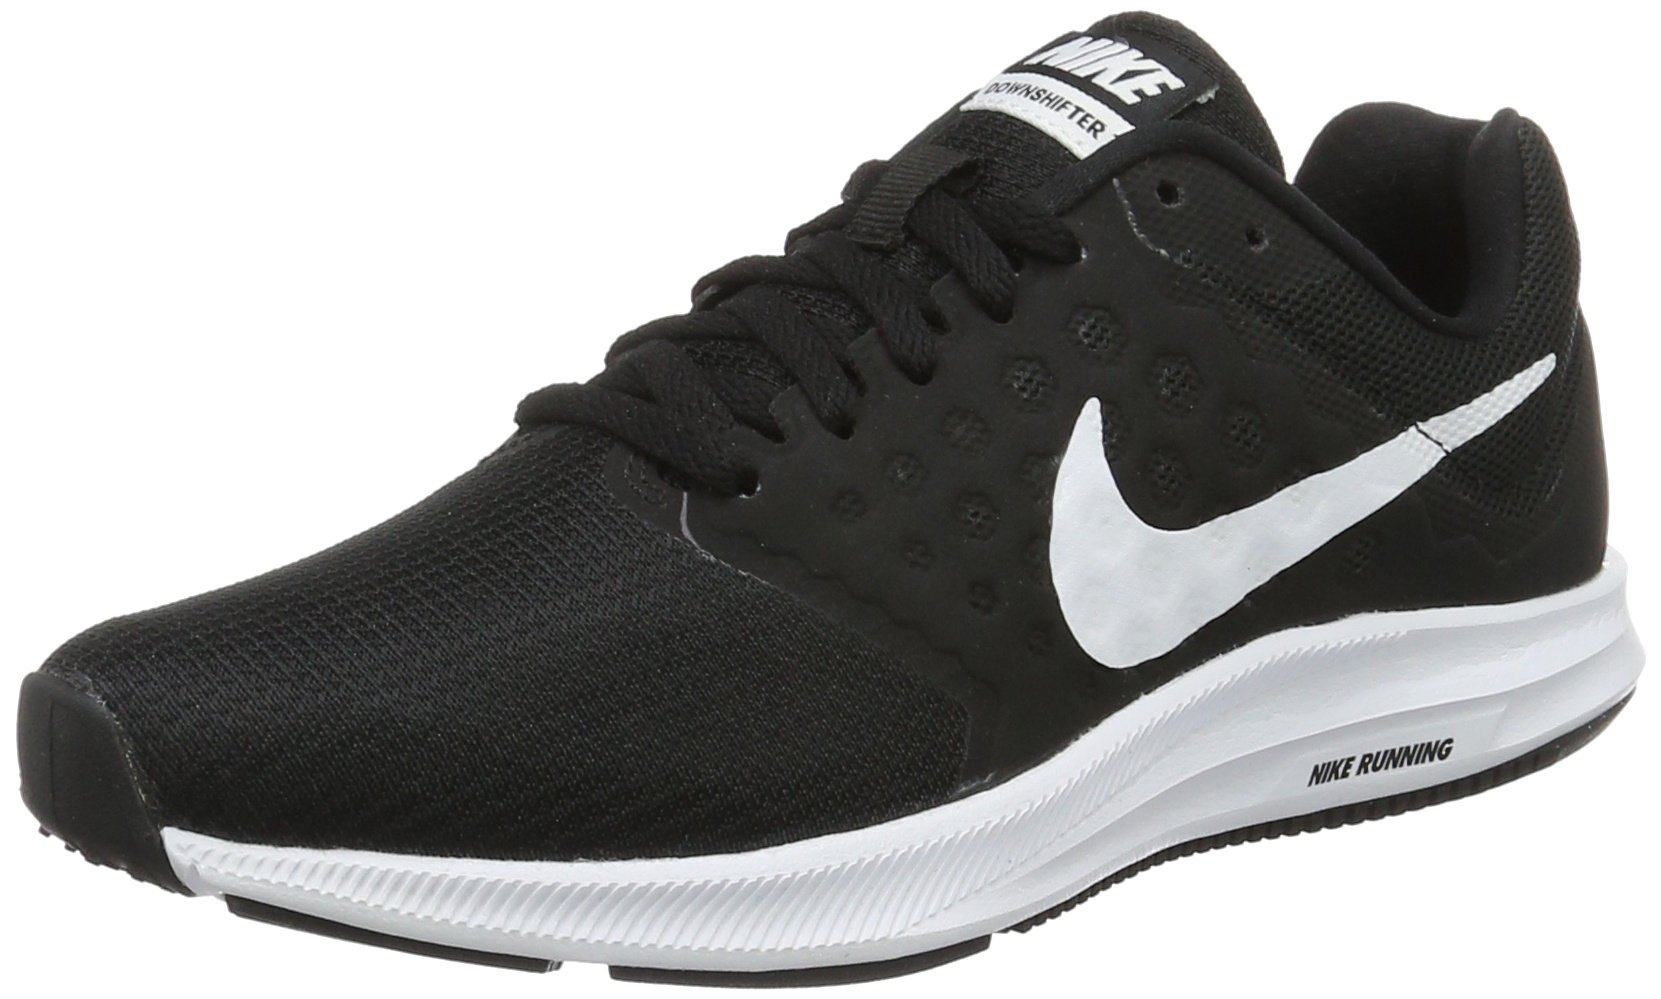 30711380c7bbe Galleon - Nike Women s Downshifter 7 Running Shoe Black White Size 6.5 M US